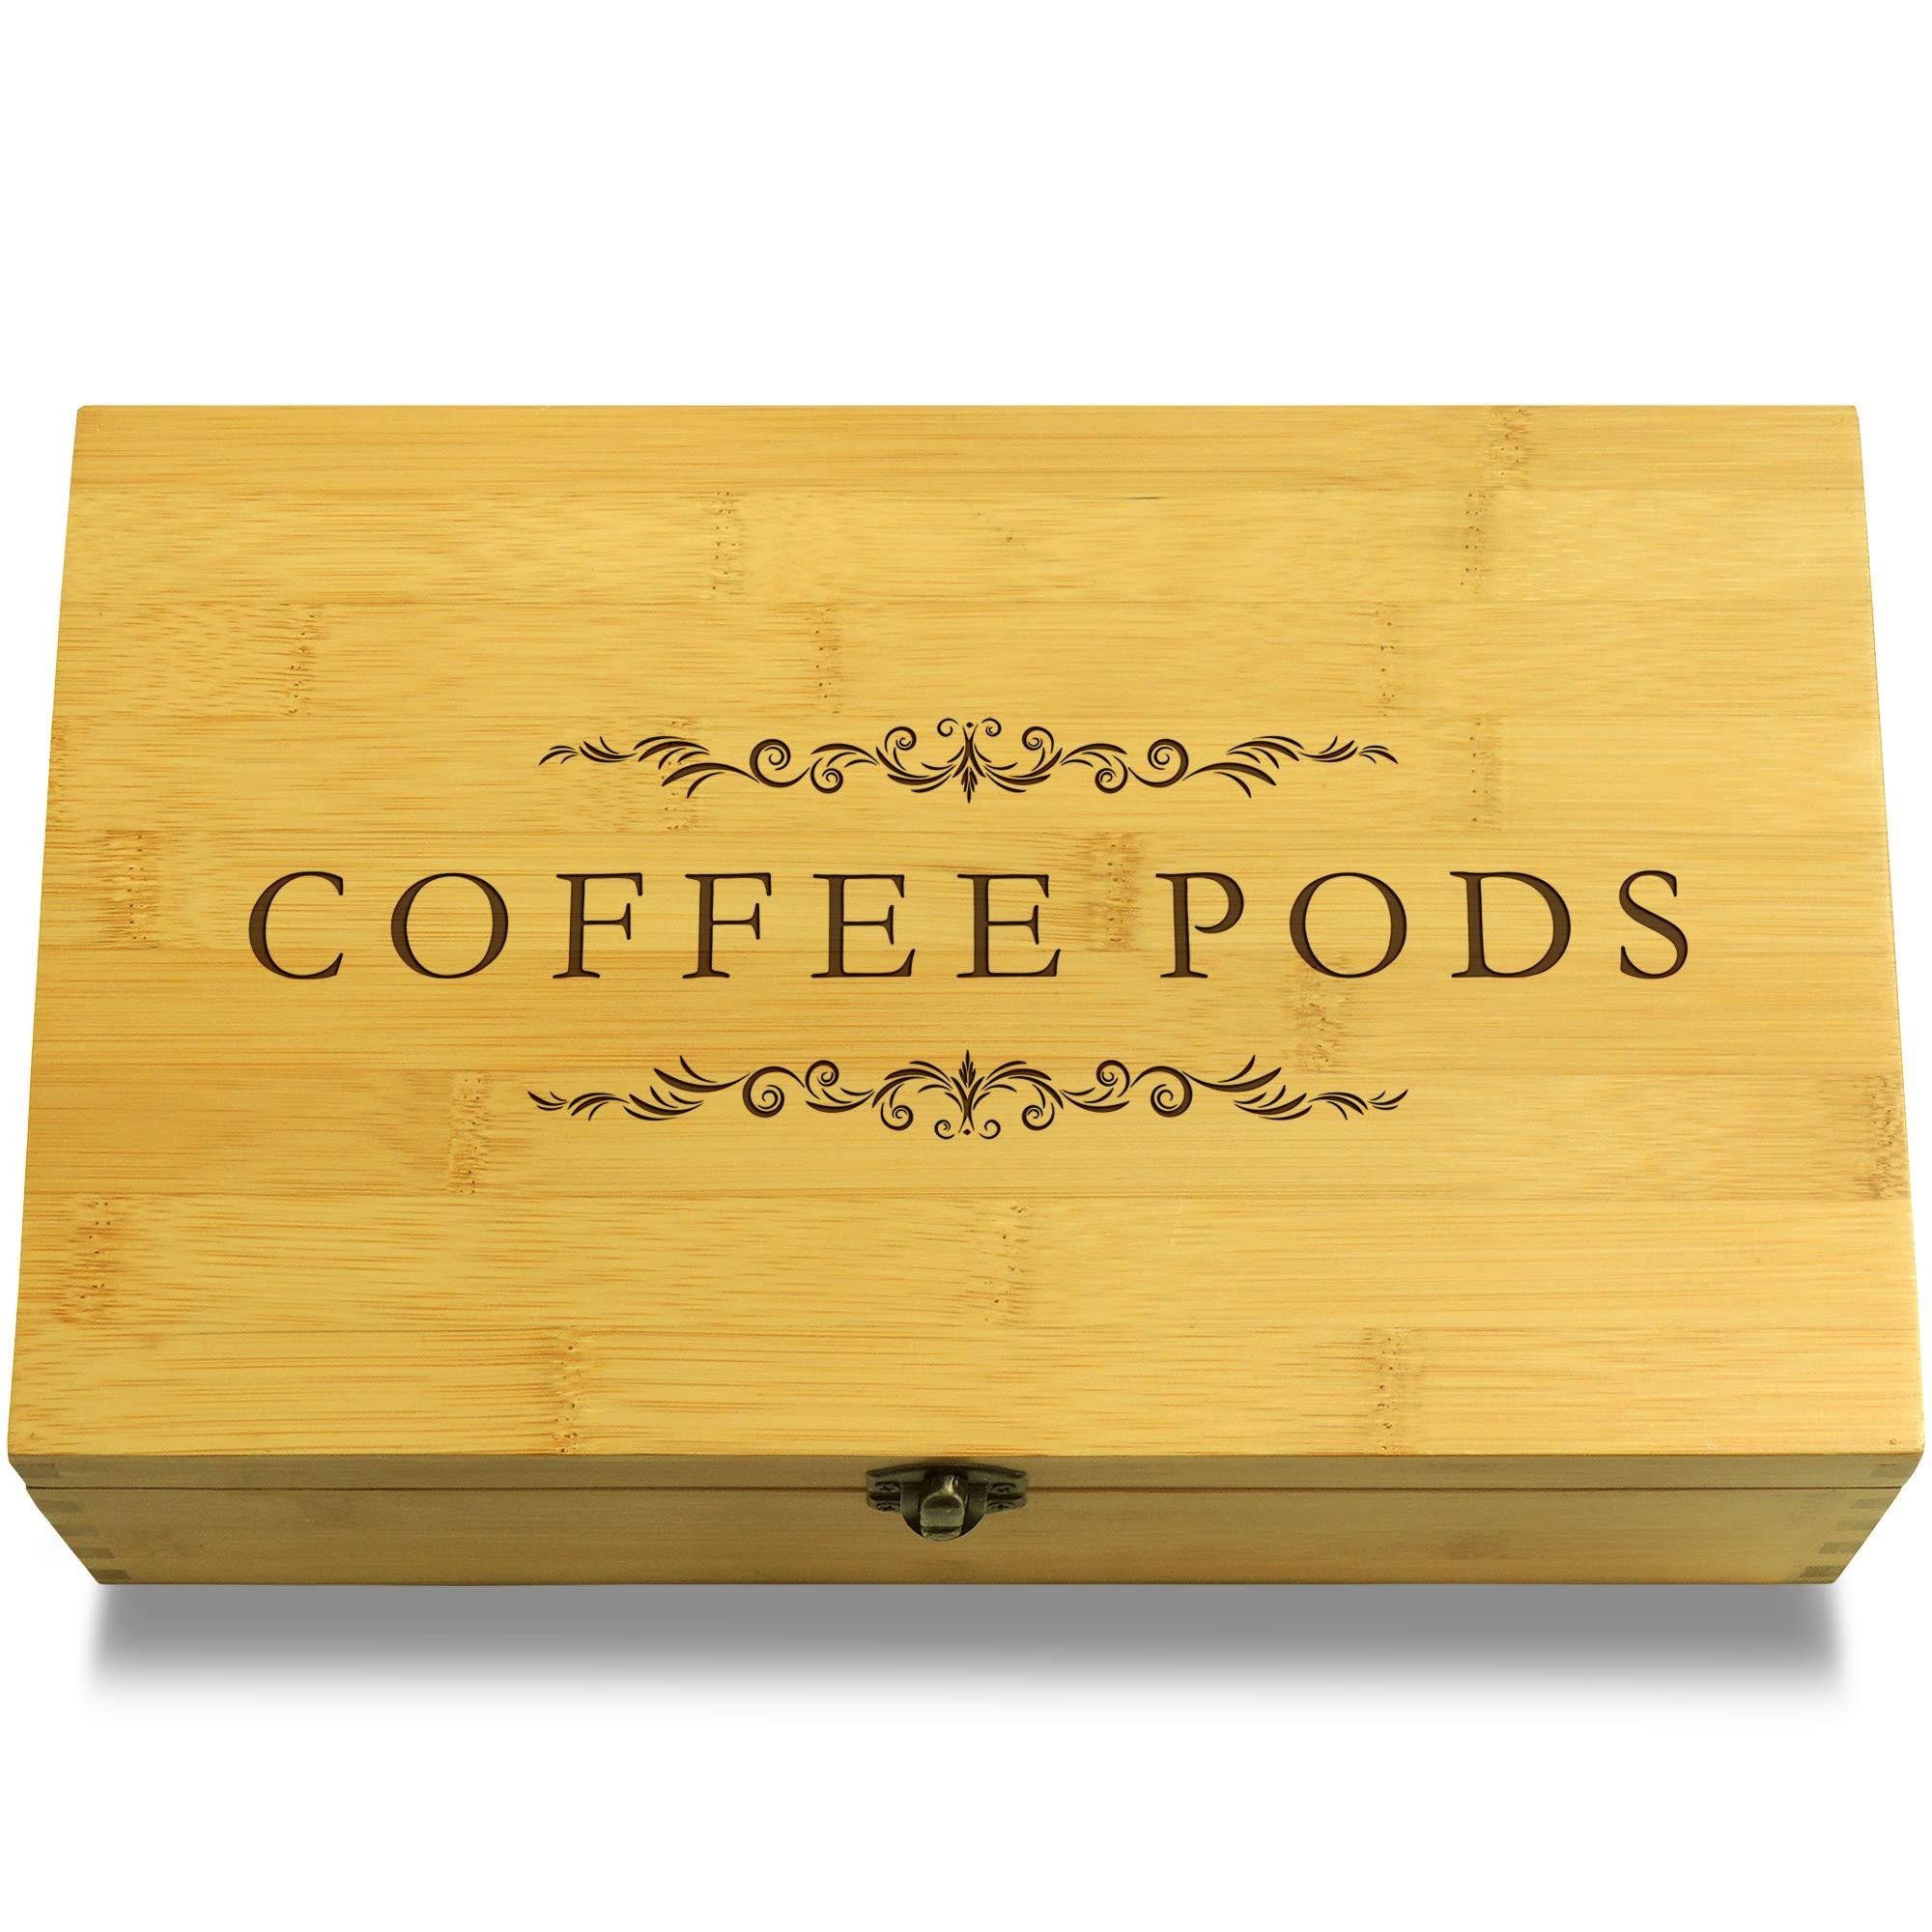 Cookbook People Coffee Pods Decorative Bamboo Wood Multikeep Box -Adjustable Organizer